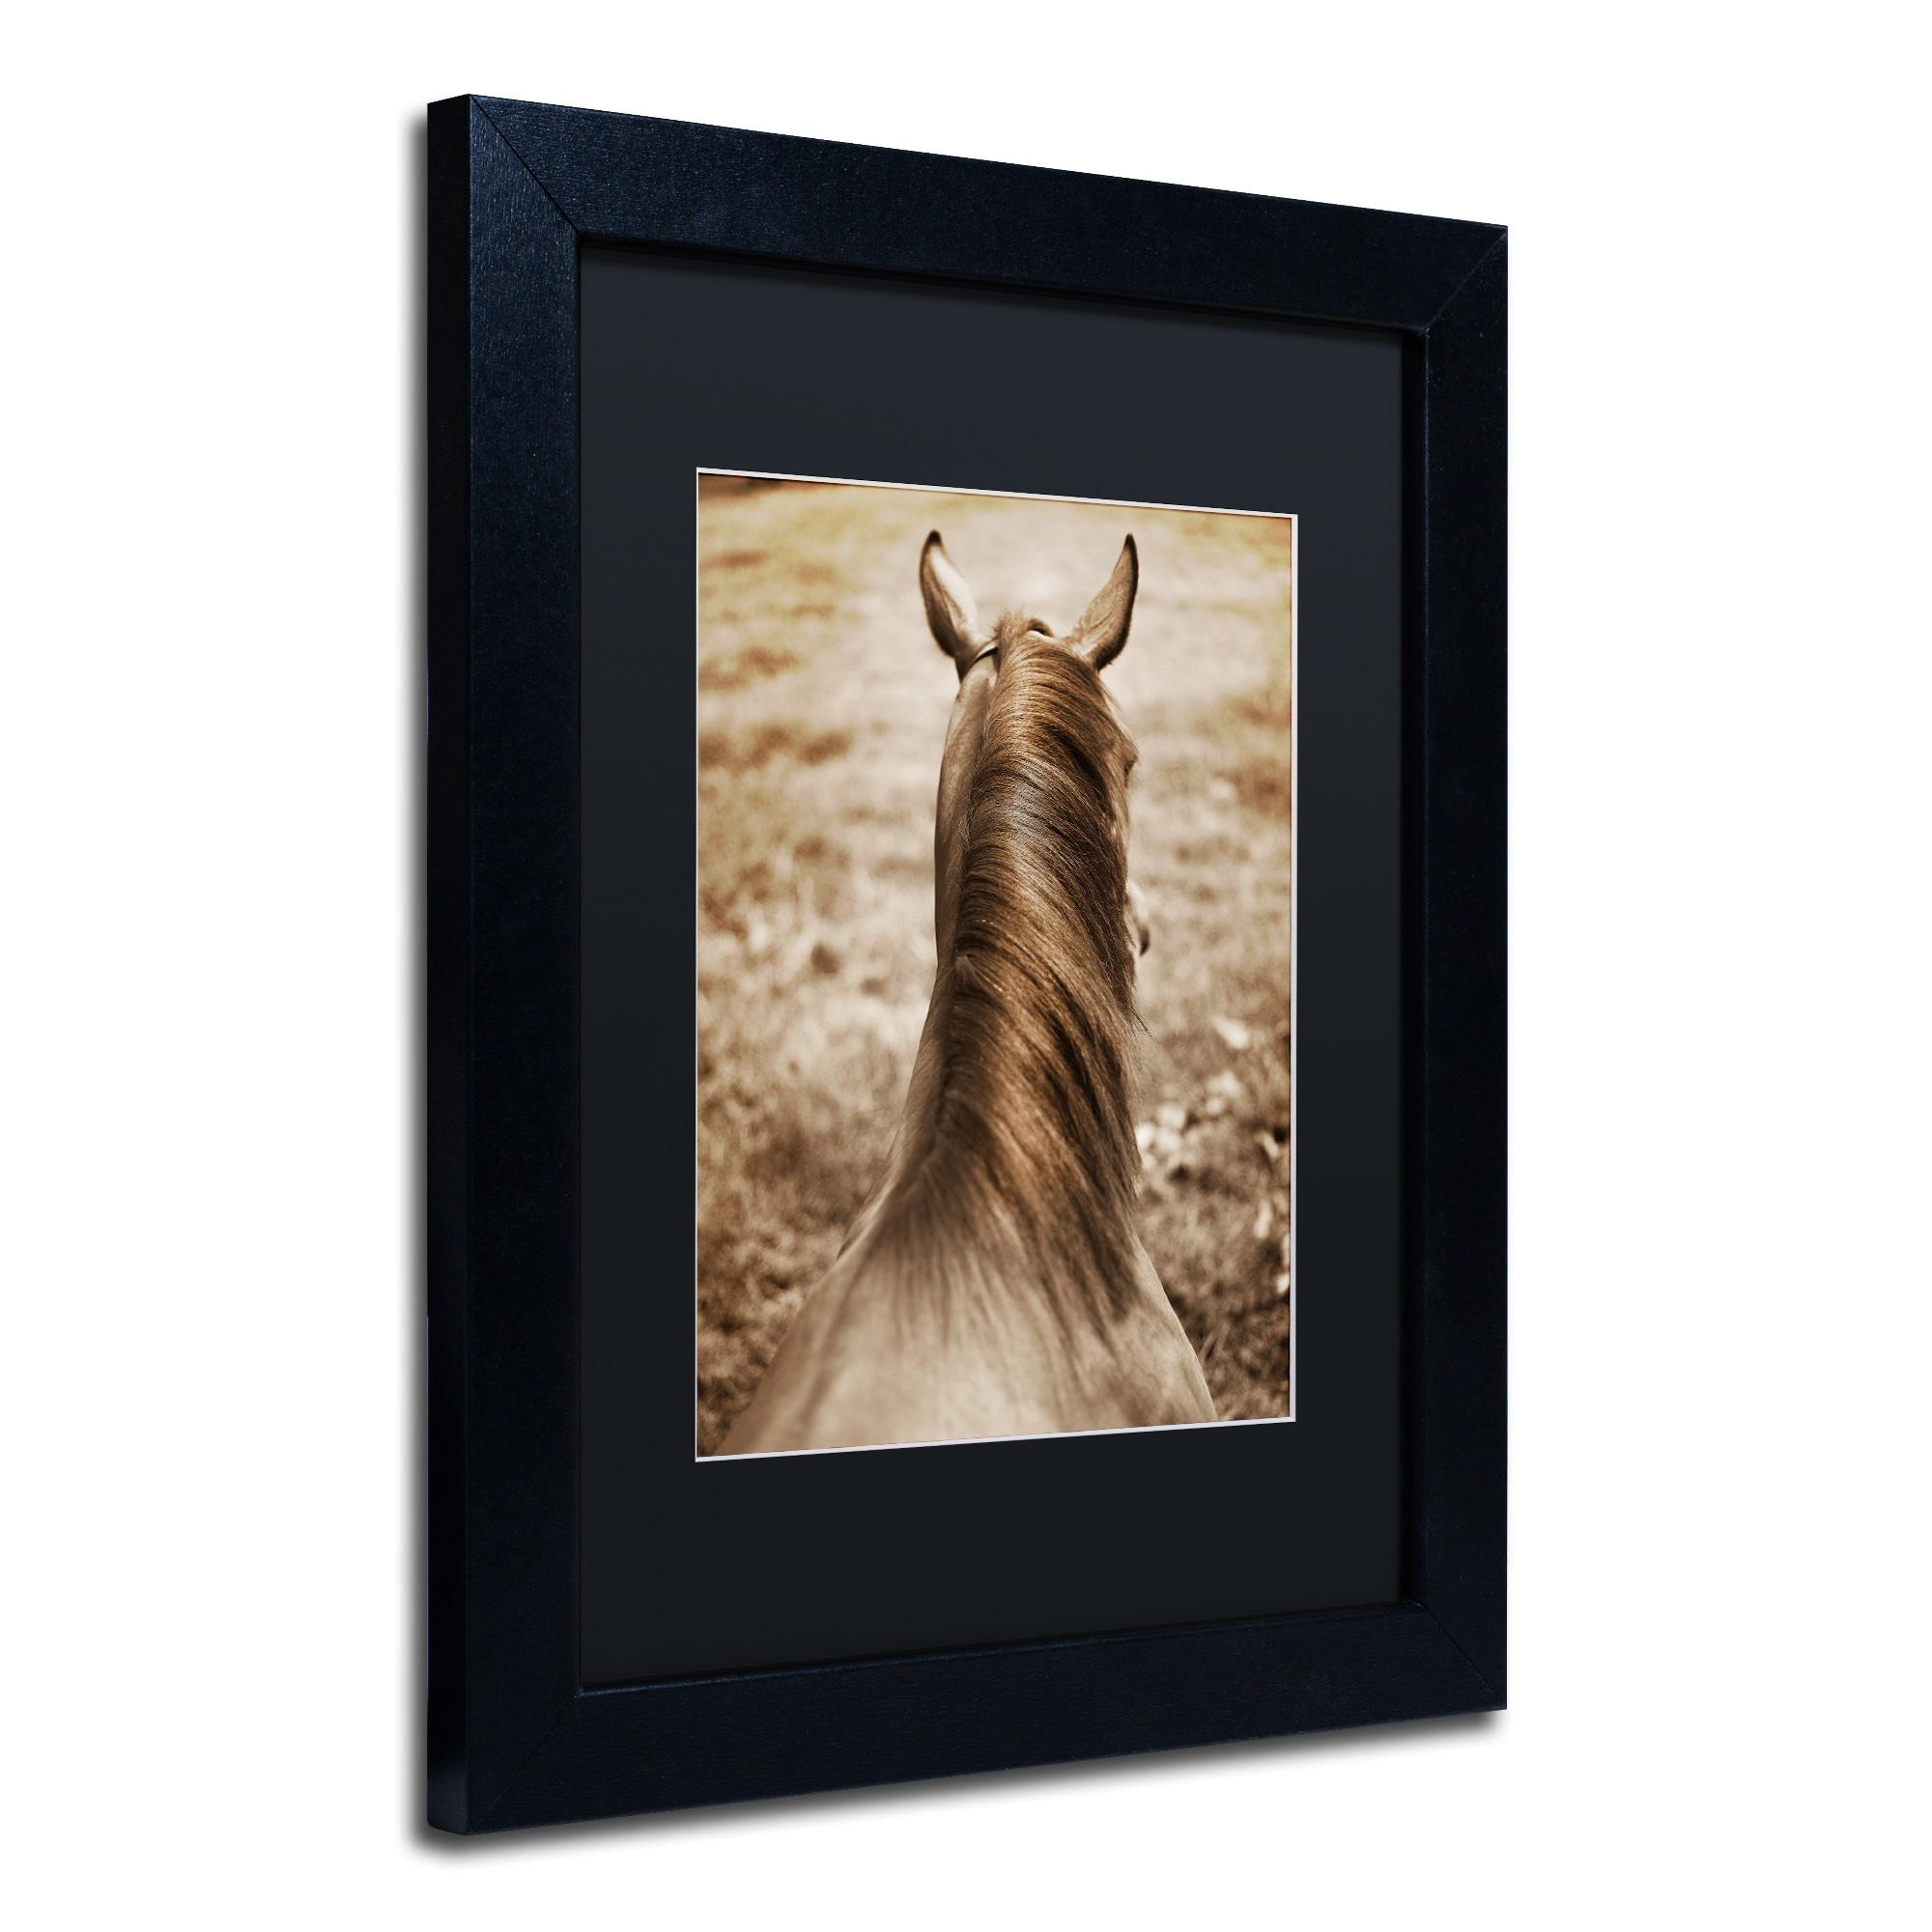 Preston Kentucky Horsemane Black Matte Wood Framed Wall Art